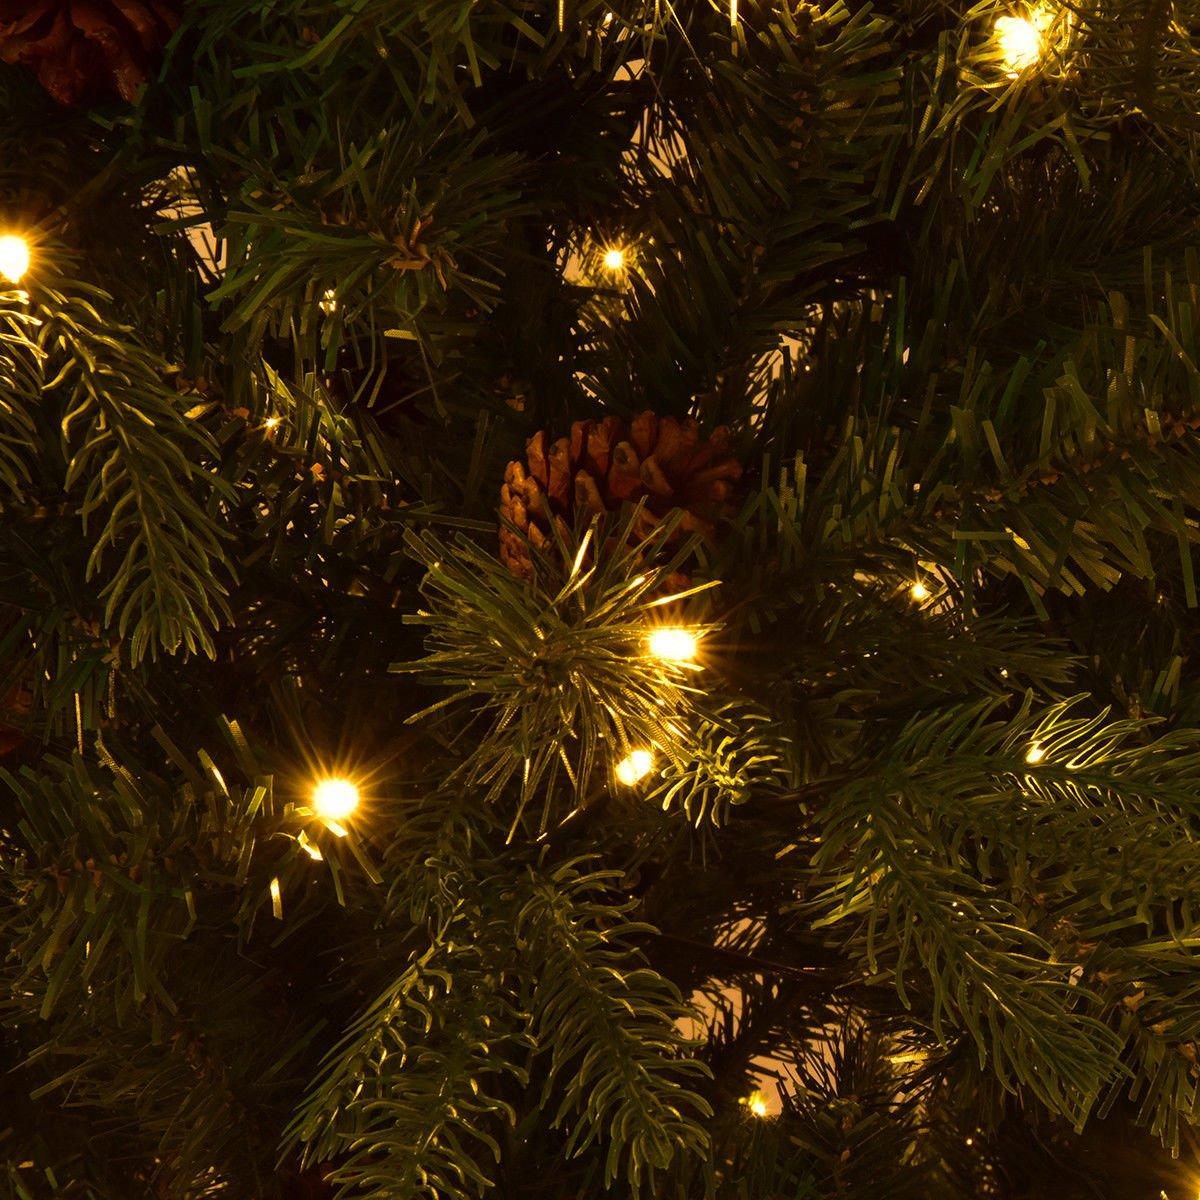 Amazon.com: Goplus 7.5Ft Pre-Lit Artificial Christmas Tree Premium ...